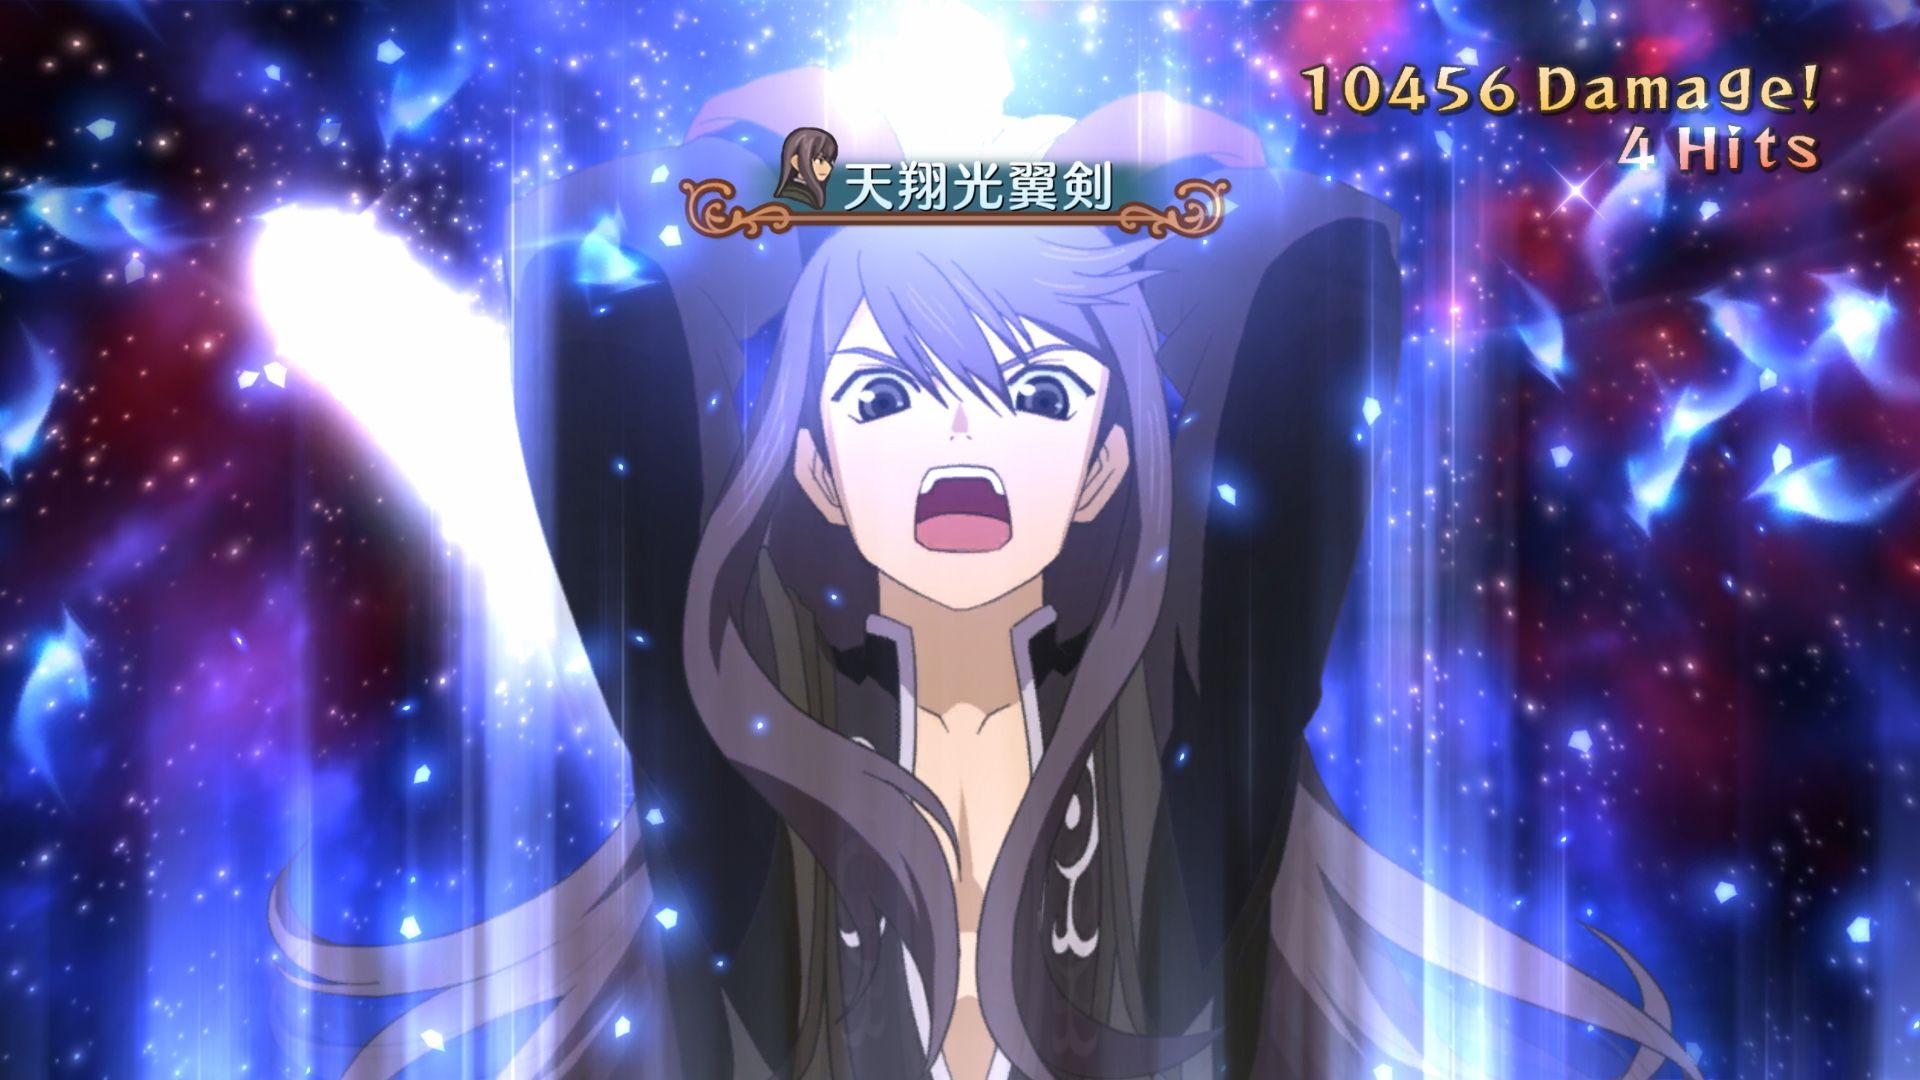 Screenshot From Tales Of Vesperia